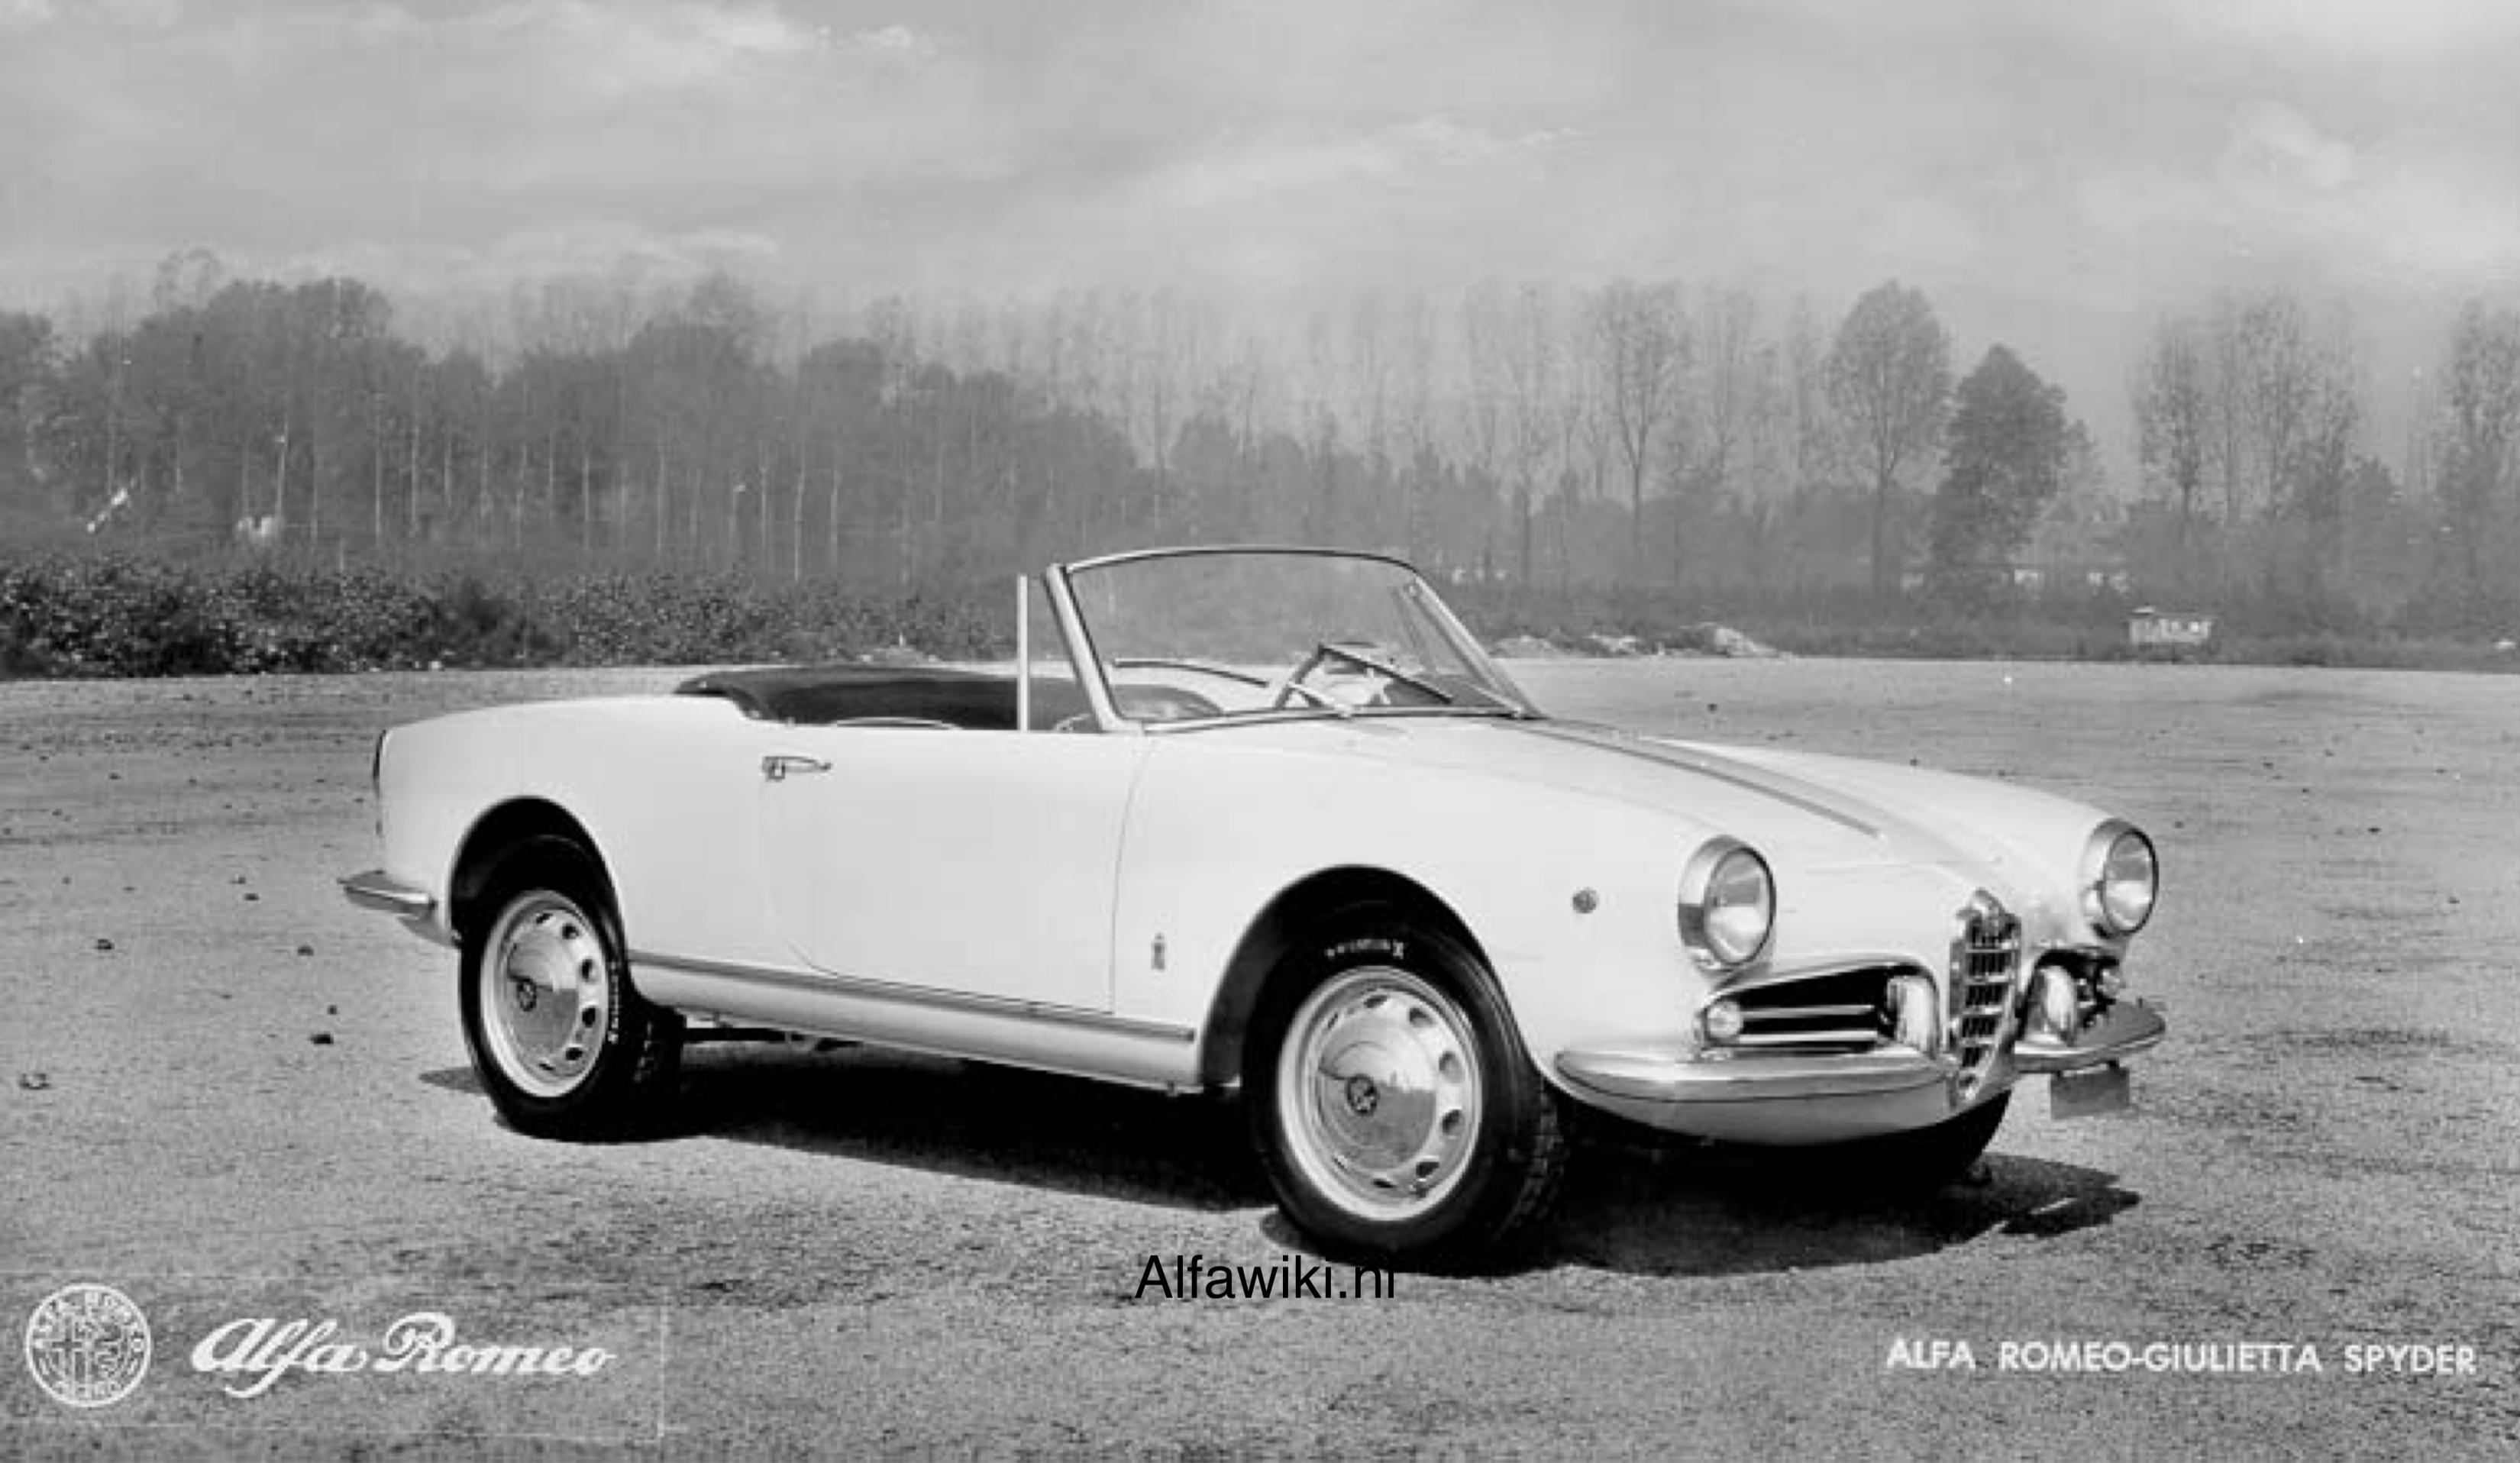 Alfa Romeo Giulietta Spider Press Photos